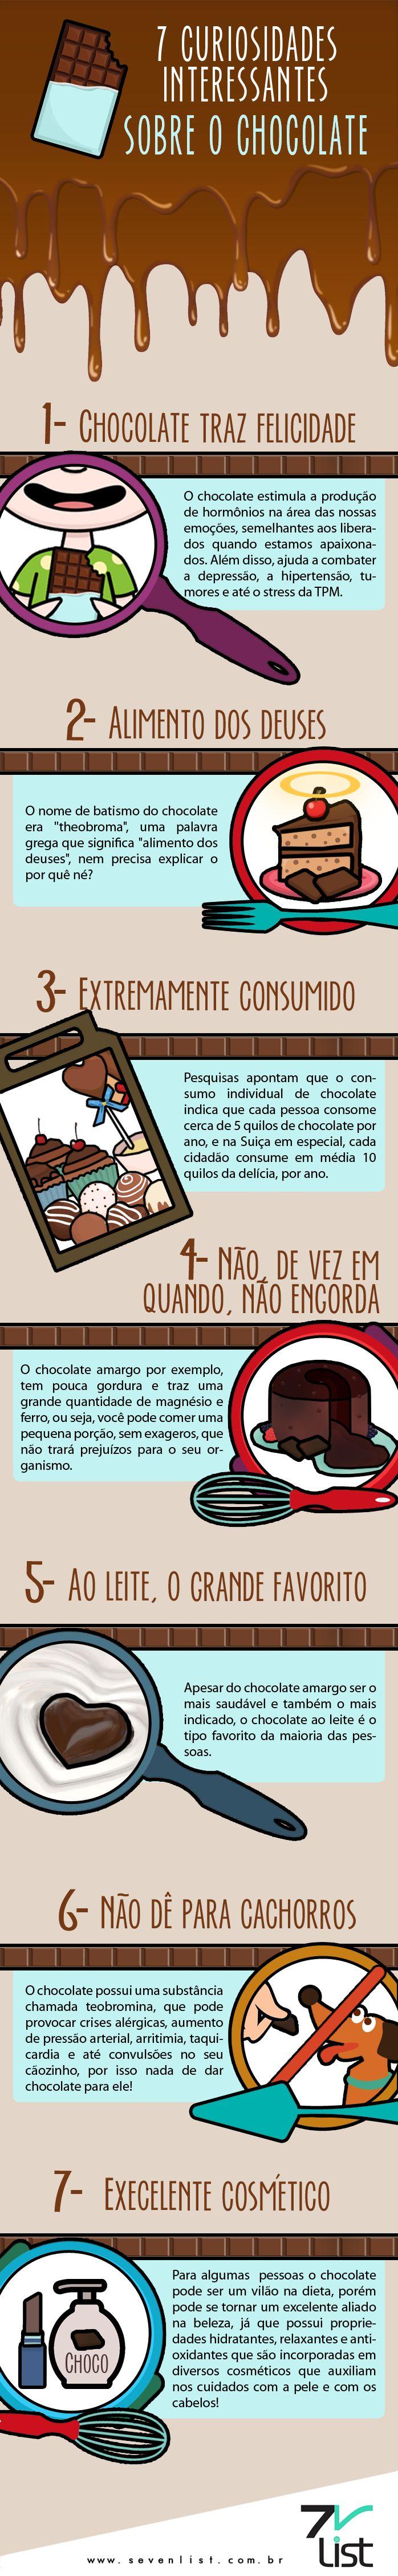 #infográfico #infographic #design #chocolate #chocólatra #delicia #doce…